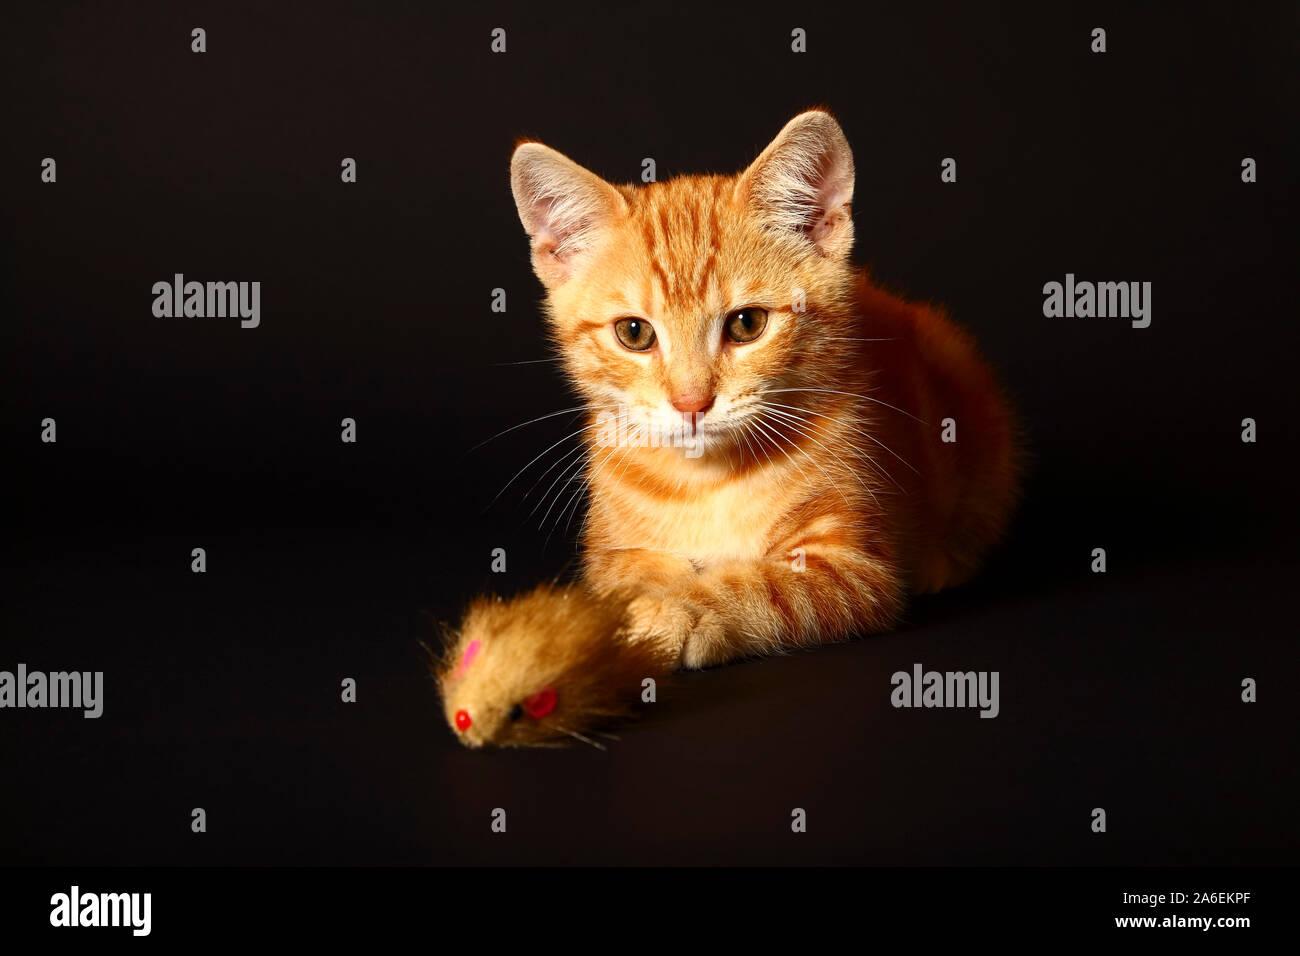 Jengibre caballa gato atigrado gato jugando con un ratón de juguete aislado en un fondo negro Foto de stock